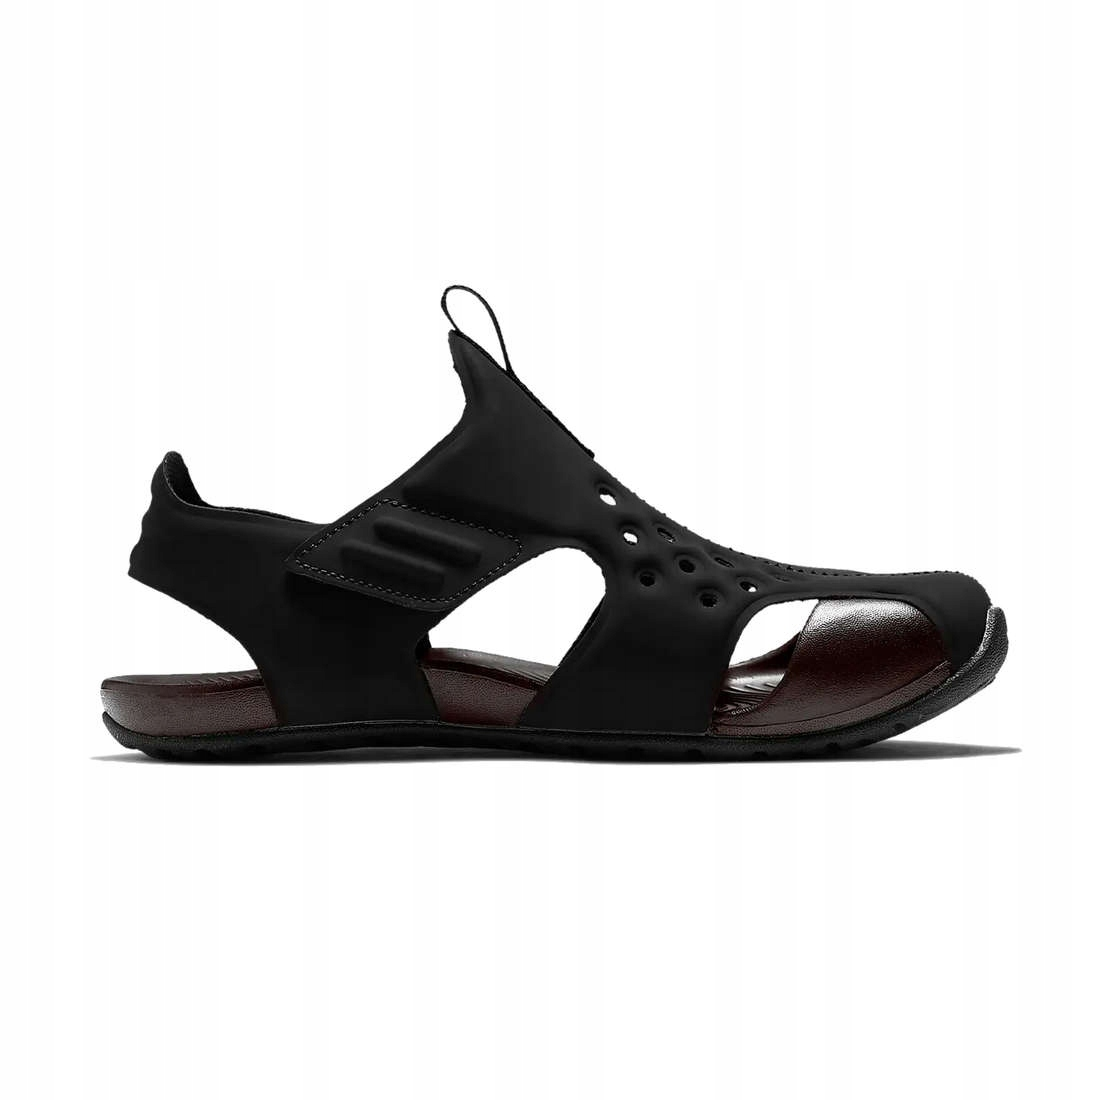 Sandały Nike Sunray Protect 2 943826-001 r.29.5